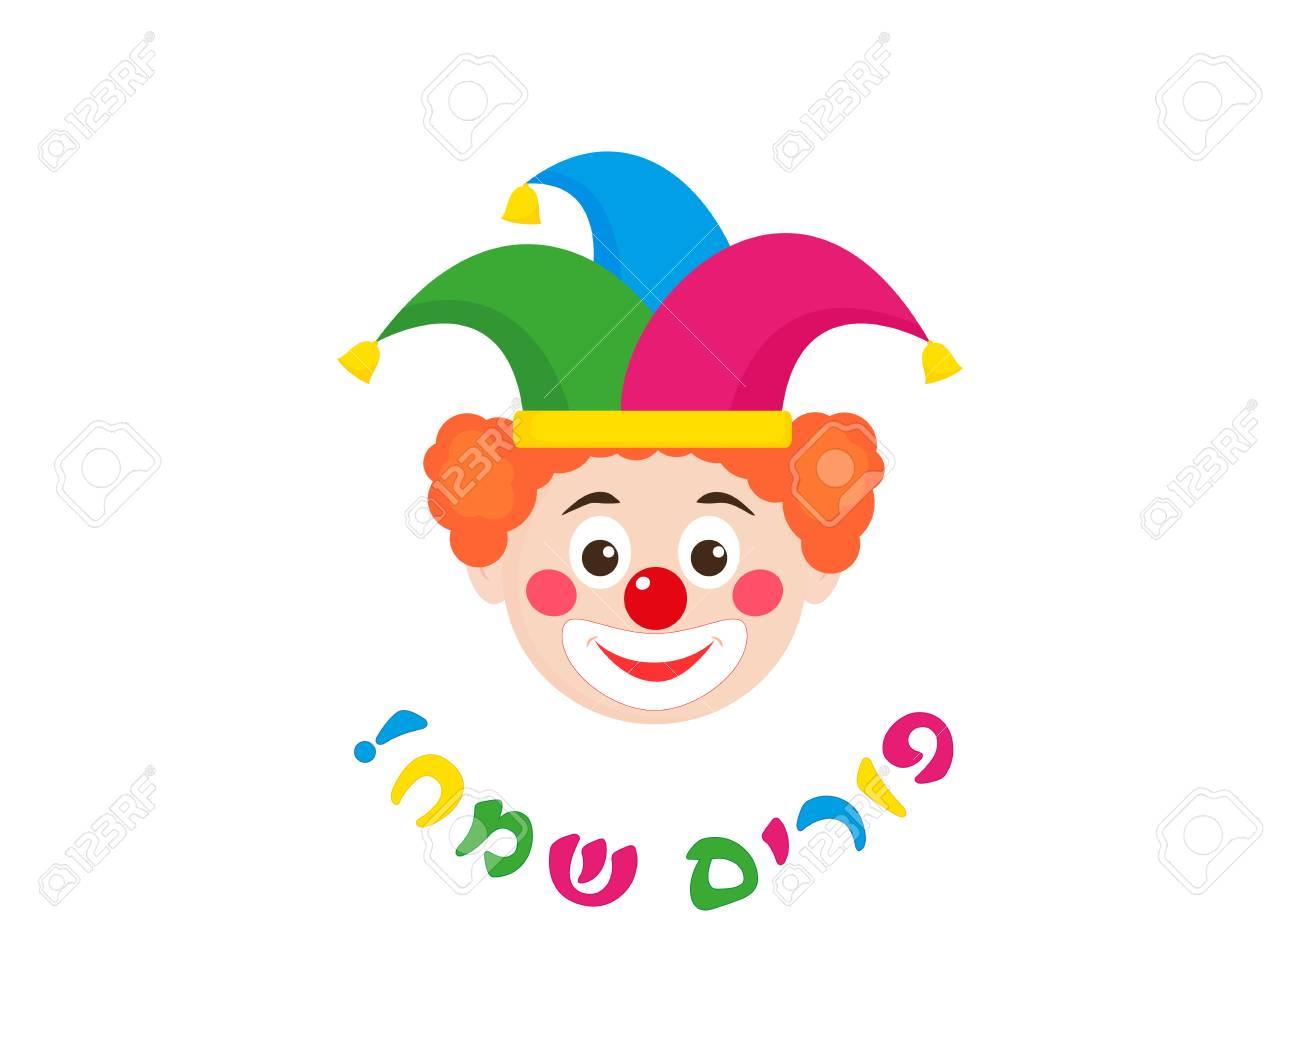 Jewish holiday of purim clown and greeting inscription in hebrew jewish holiday of purim clown and greeting inscription in hebrew happy purim isolated m4hsunfo